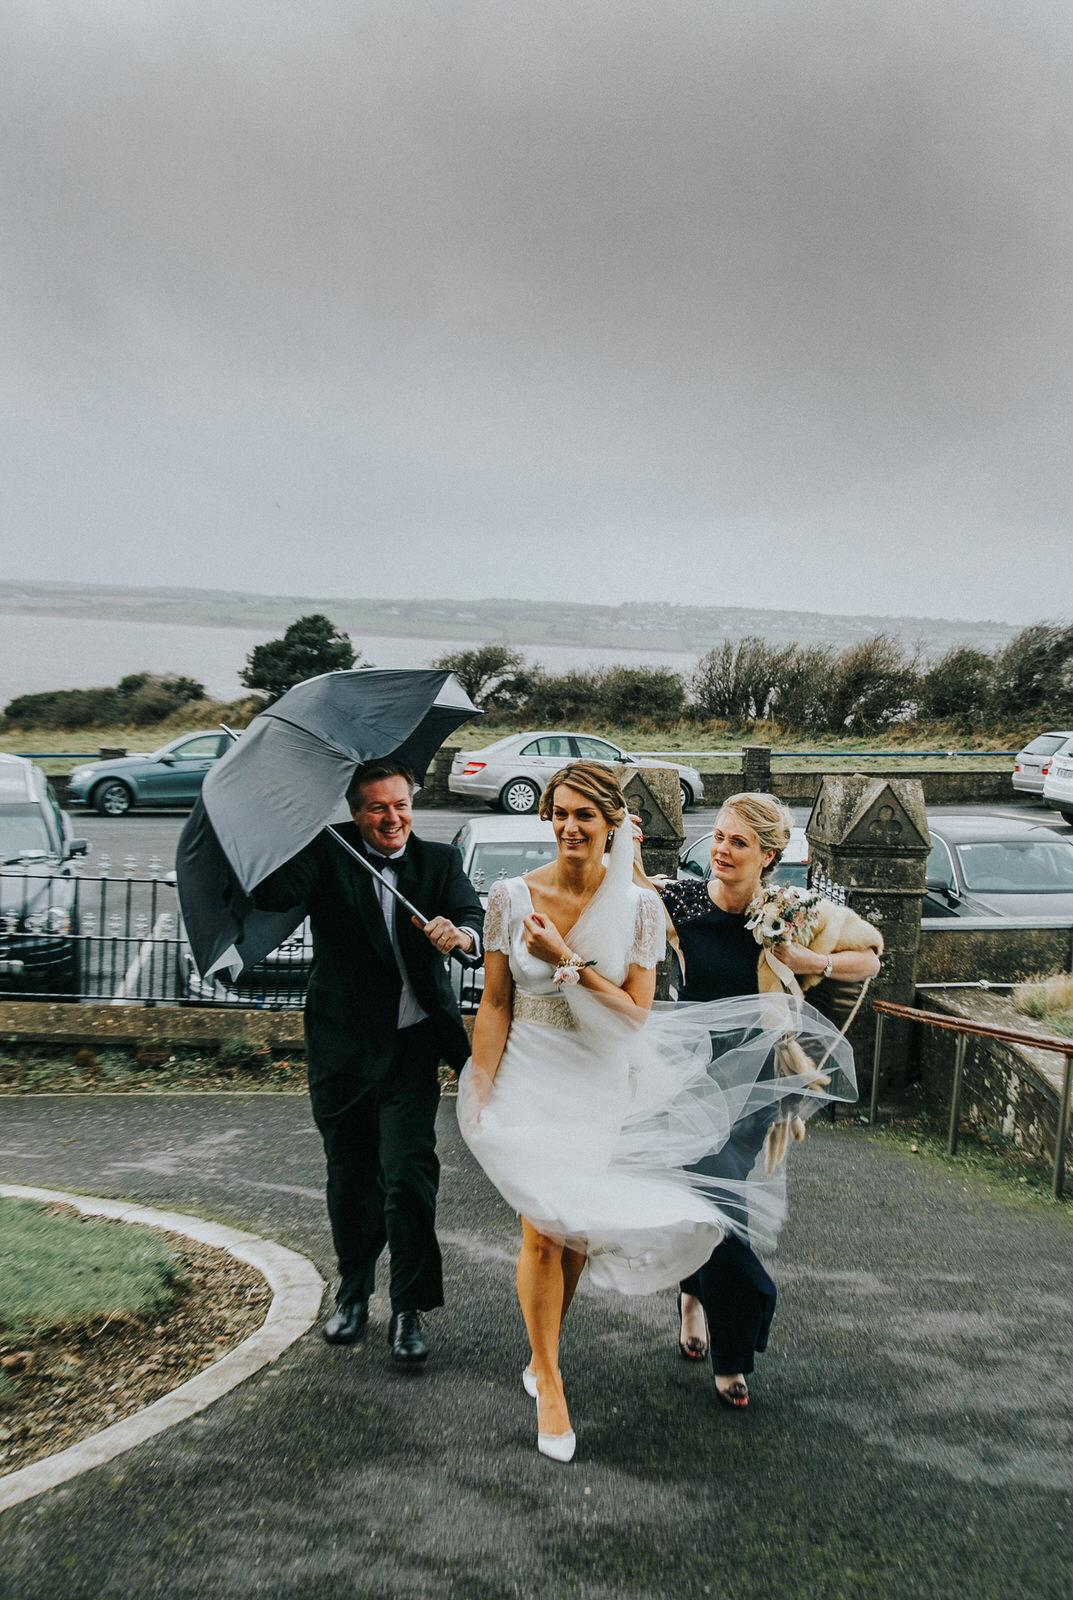 Dunbrody_House_Wedding_photographer_064.jpg